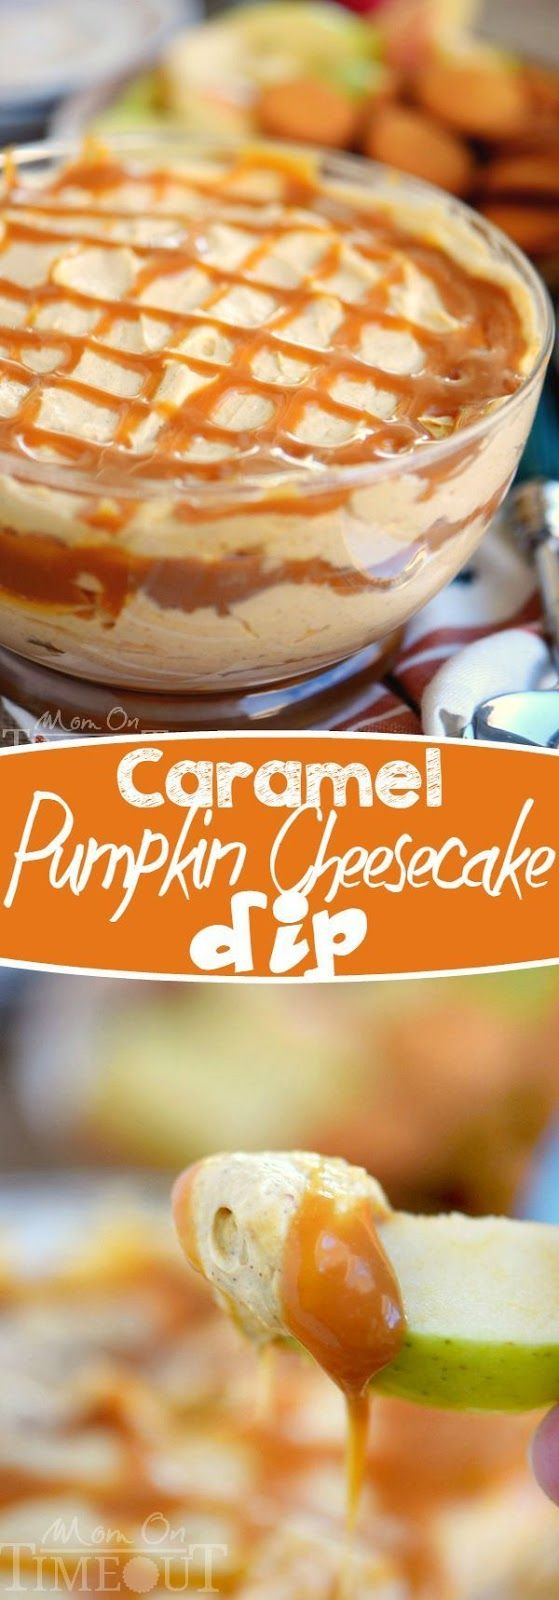 Caramel Pumpkin Cheesecake Dip   Pife